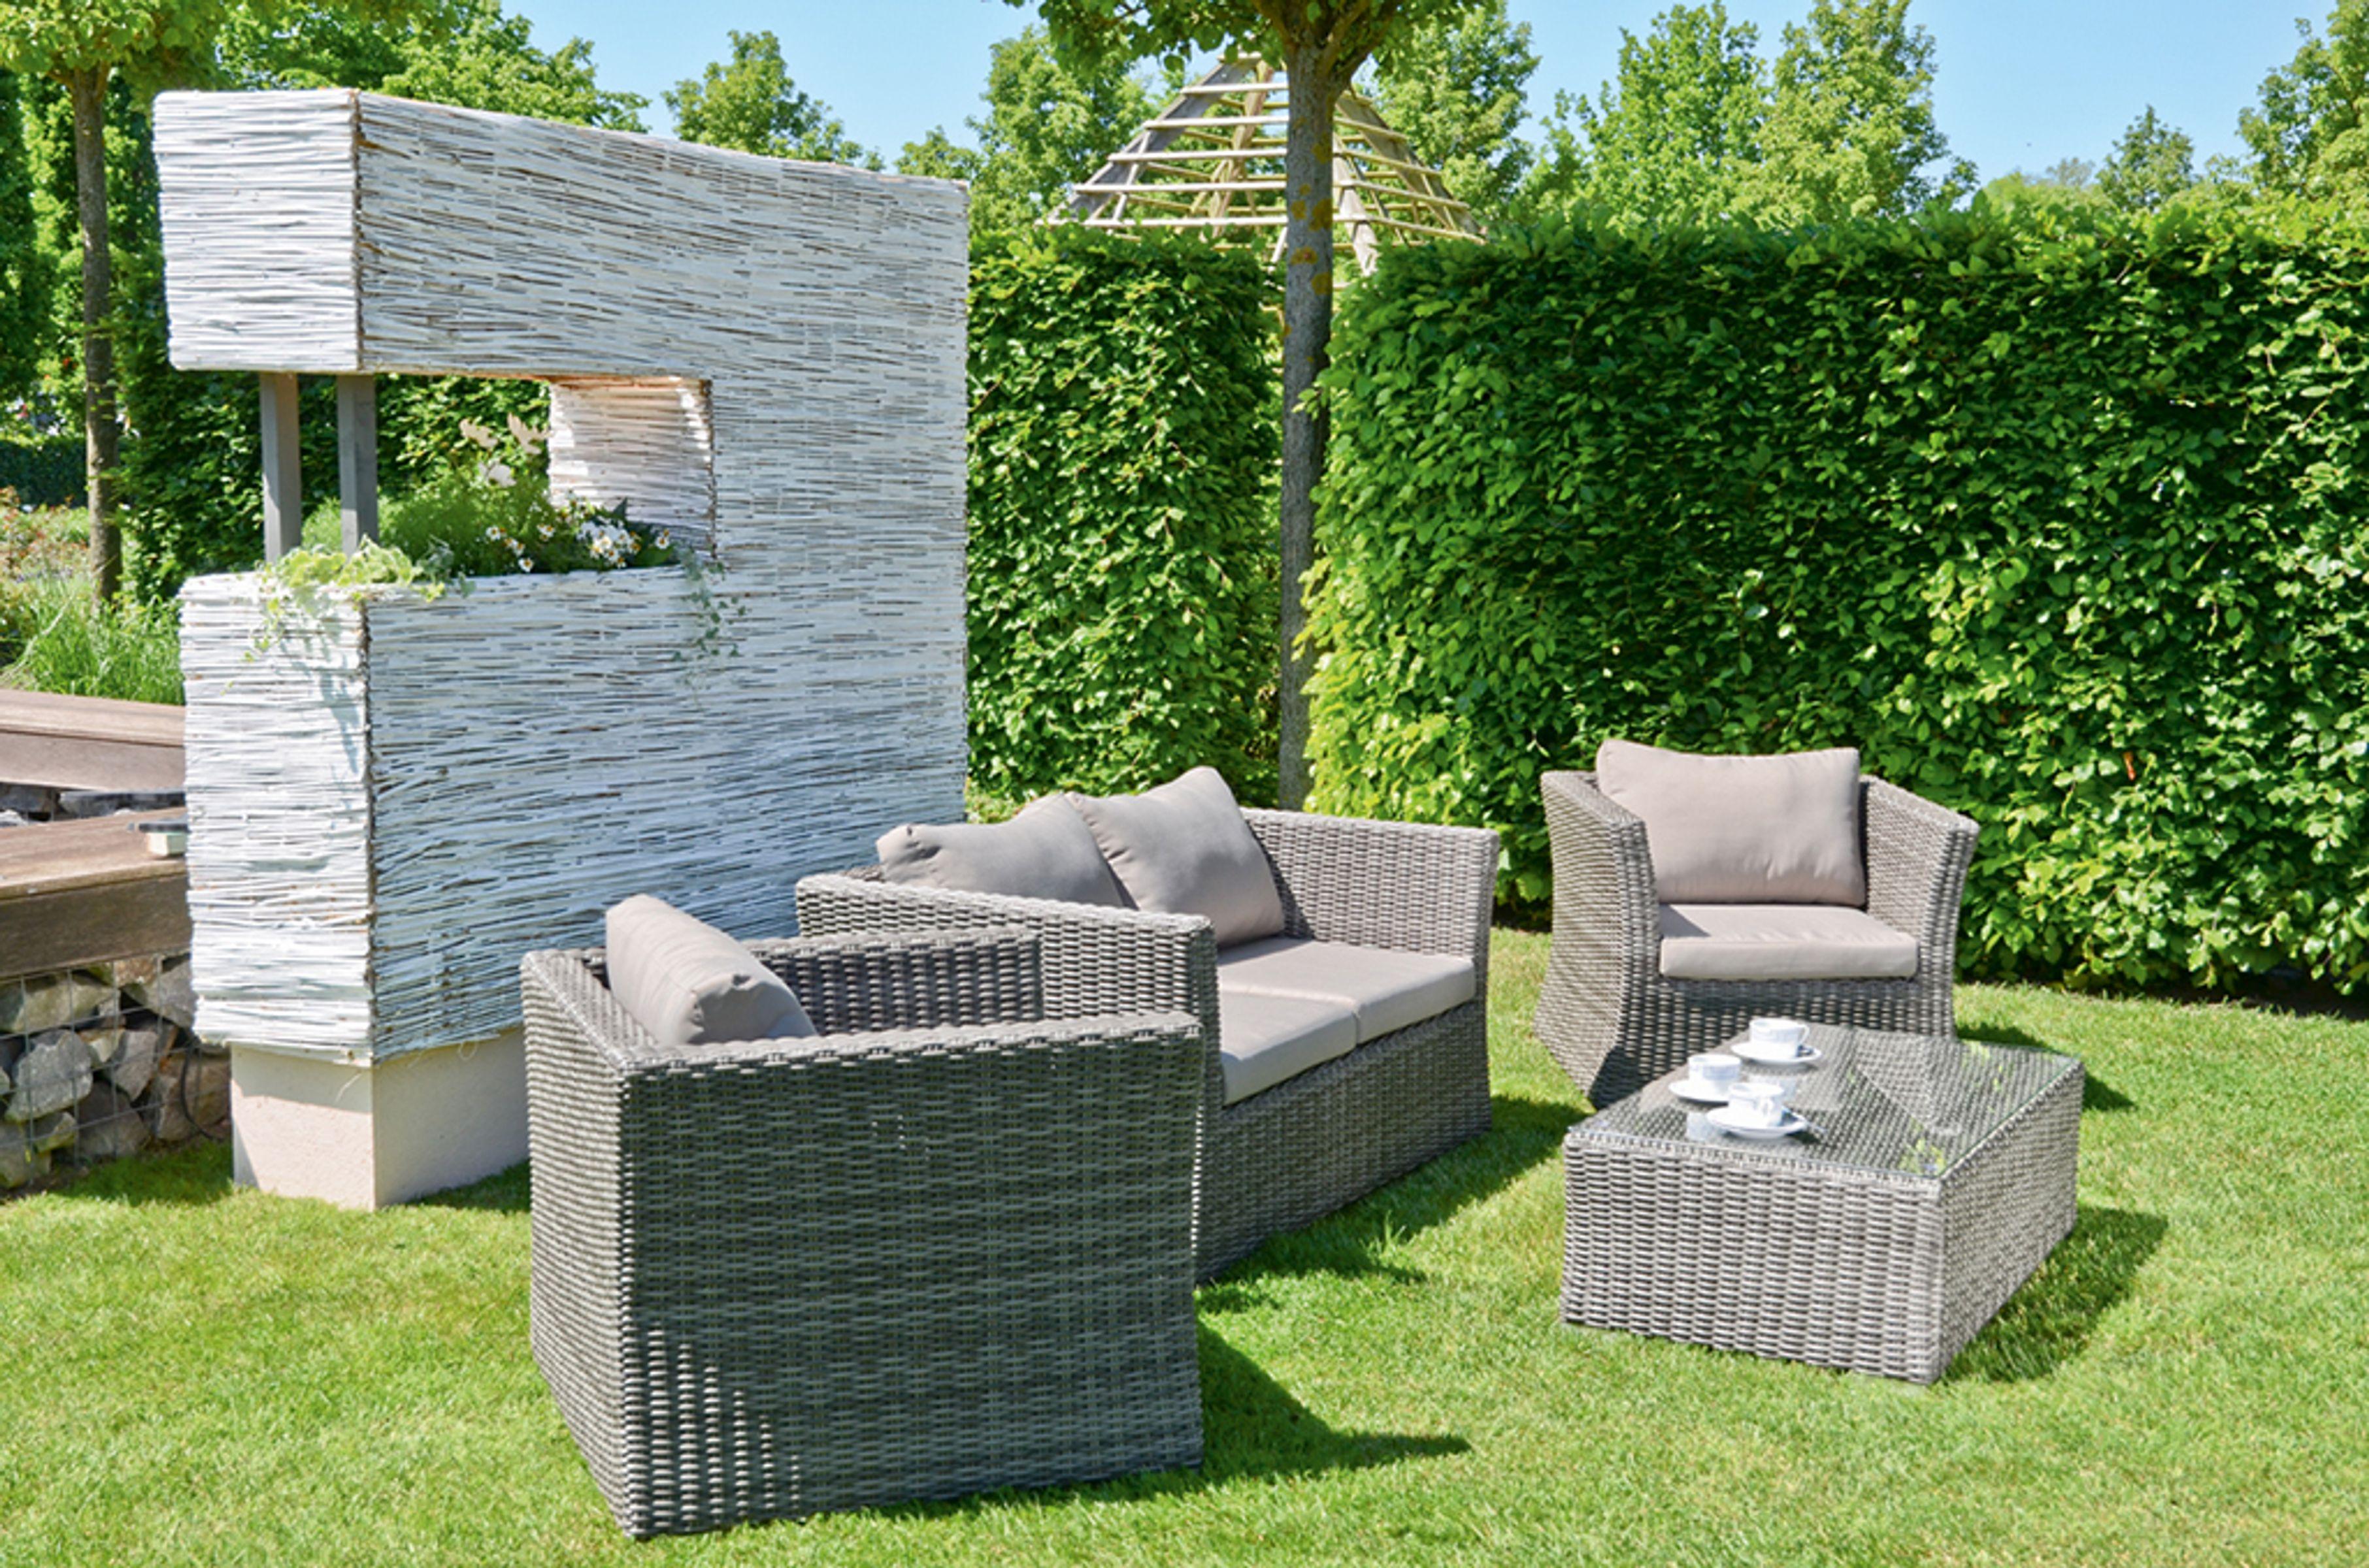 4tlg lounge gruppe garten terrasse sitzgruppe sitzecke sessel stuhl tisch ebay. Black Bedroom Furniture Sets. Home Design Ideas